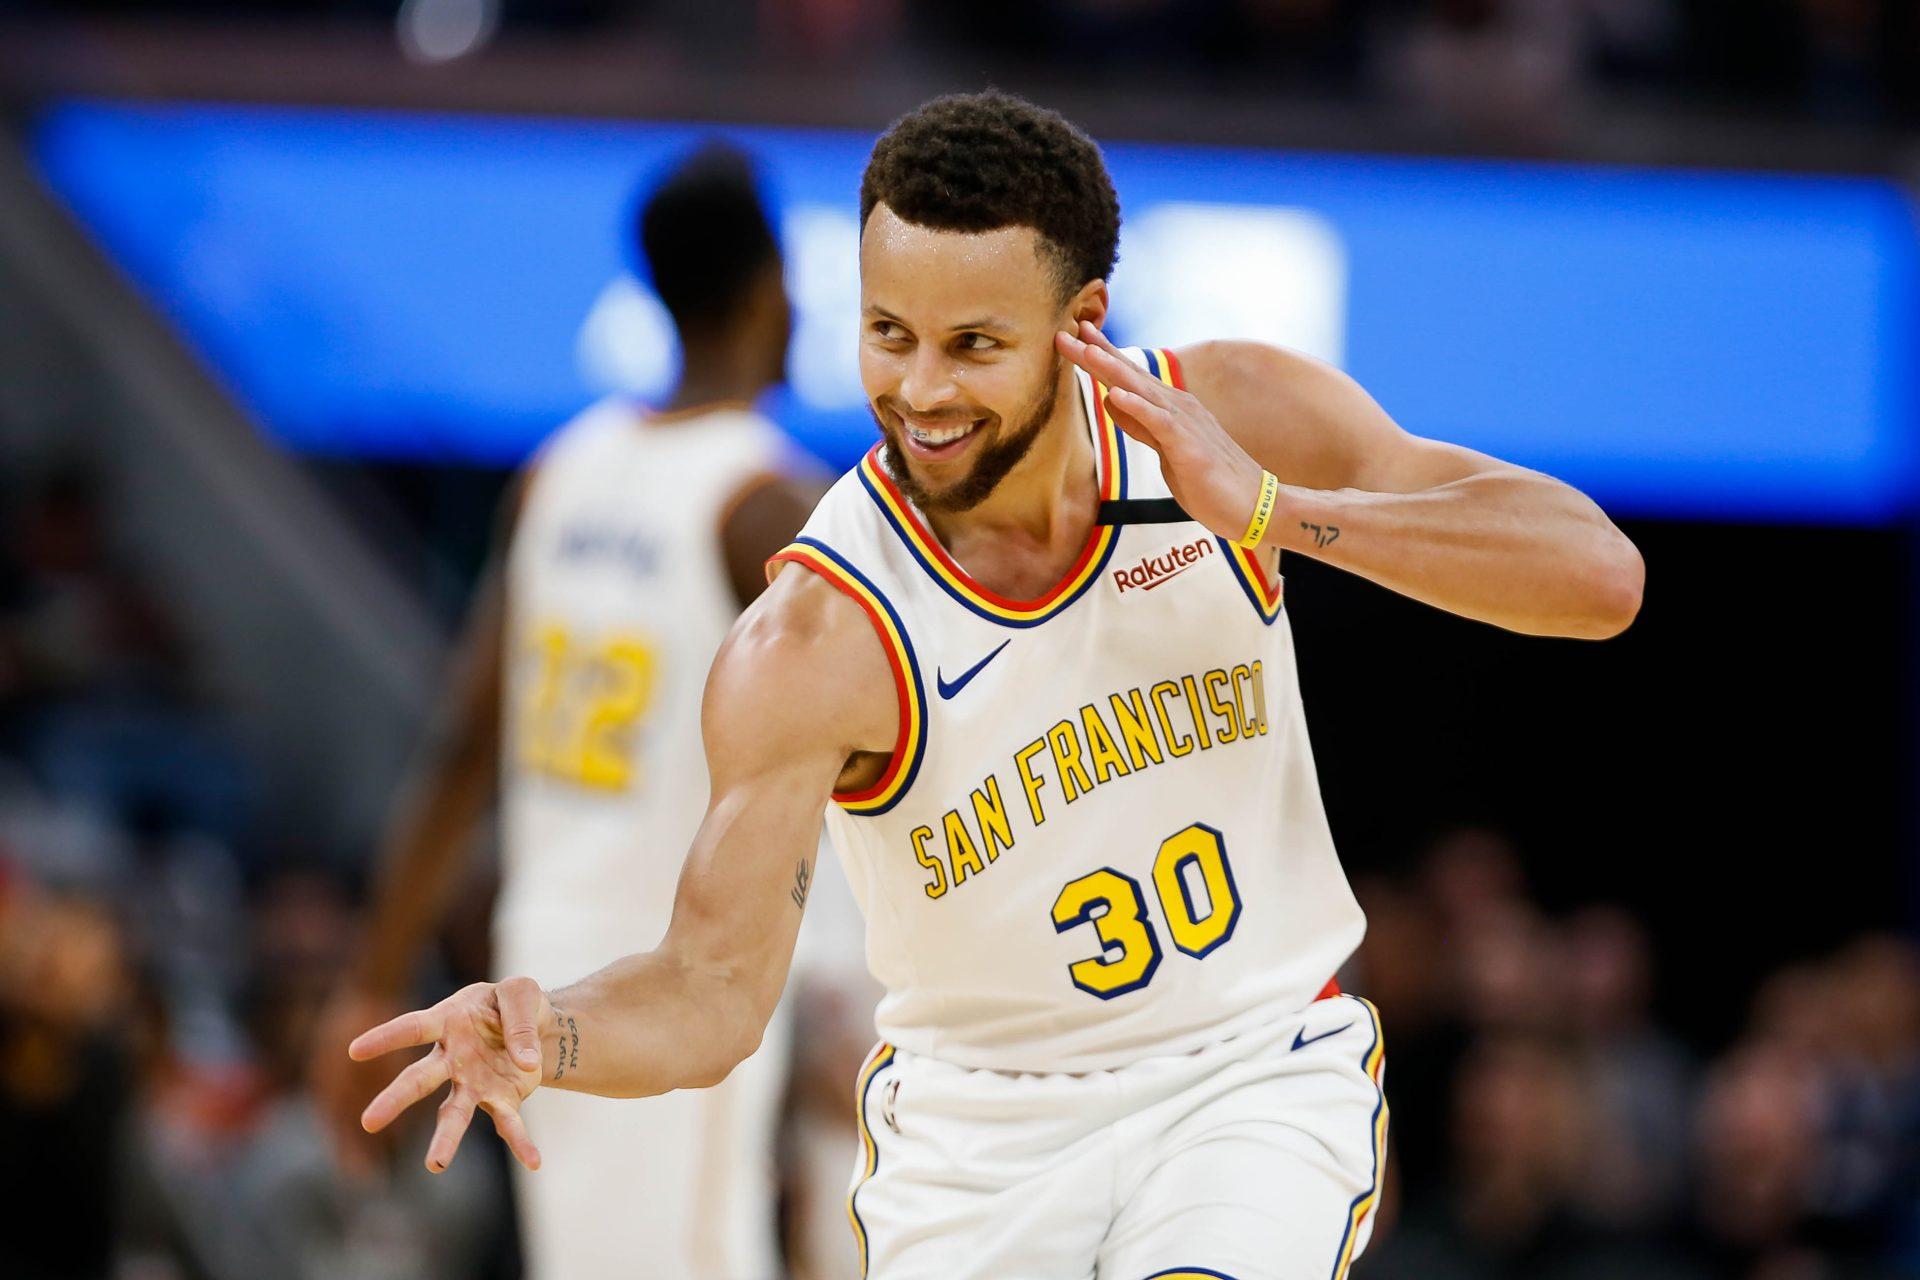 Stephen Curry por extender su marca de triples en NBA - Momento Deportivo RD